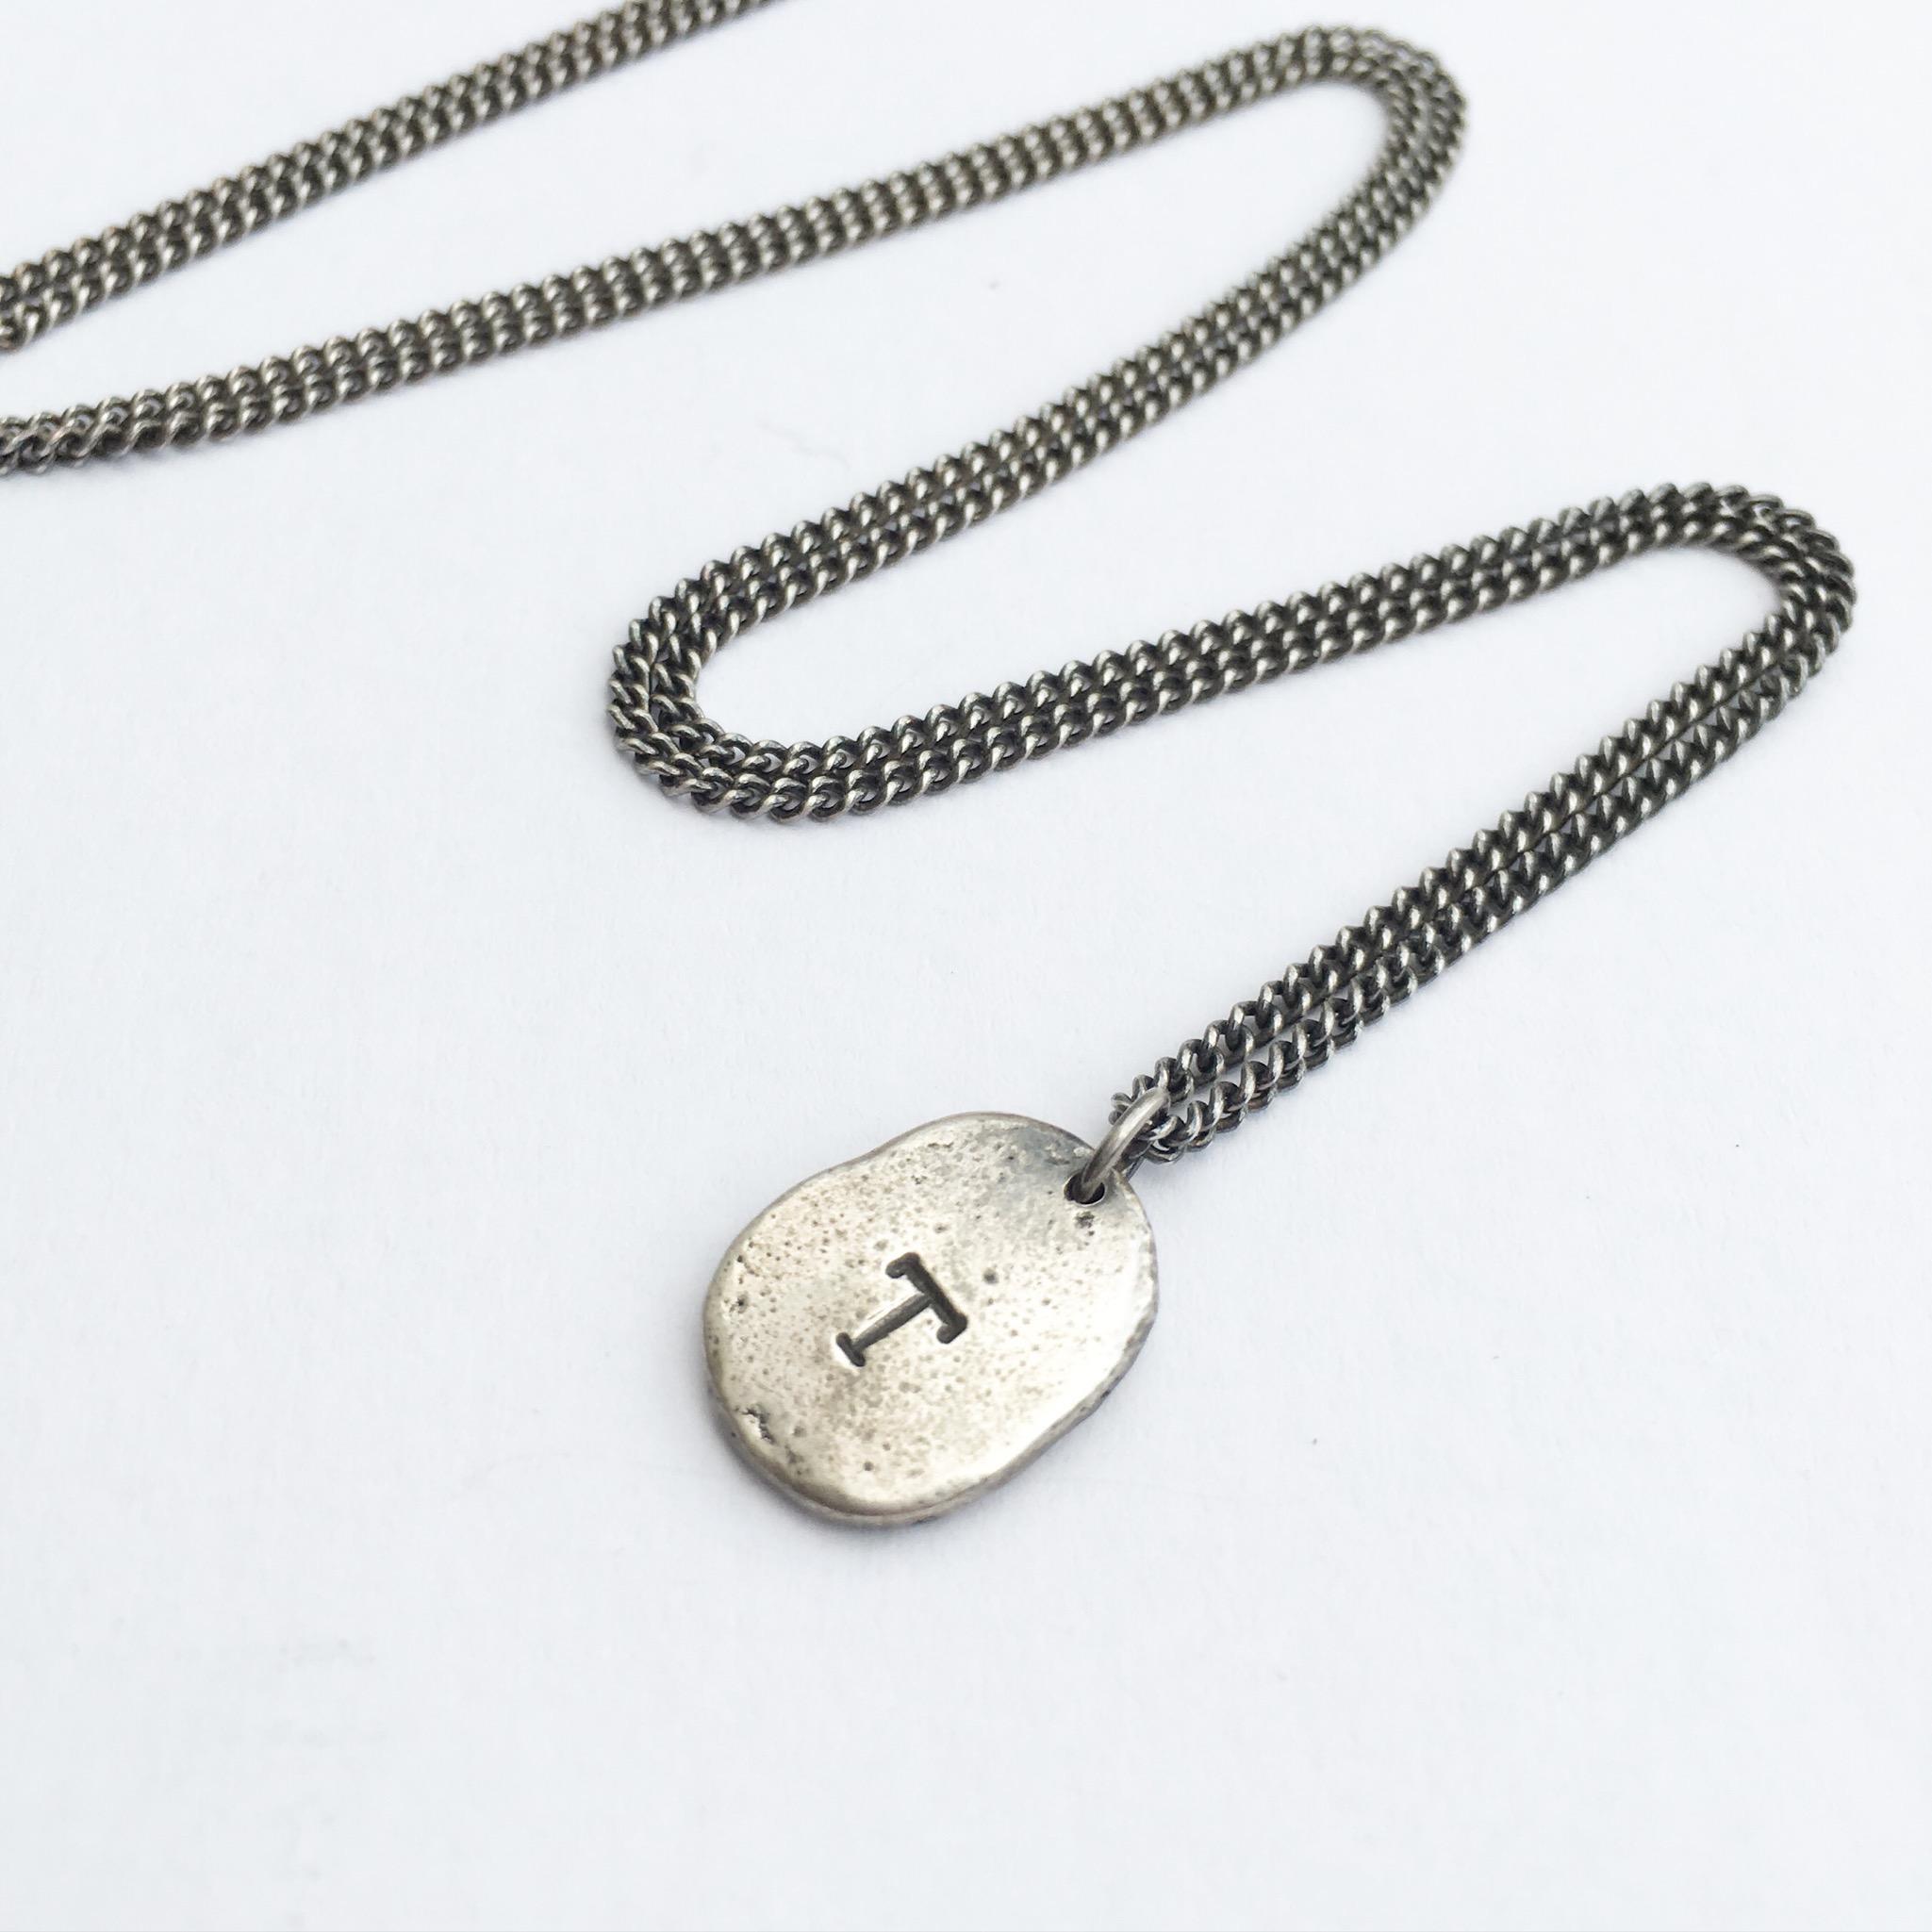 mens jewellery uk handmade unisex oxidised sterling silver long curb chain pendant letter initial jasmine bowden devon exeter jeweller.jpg